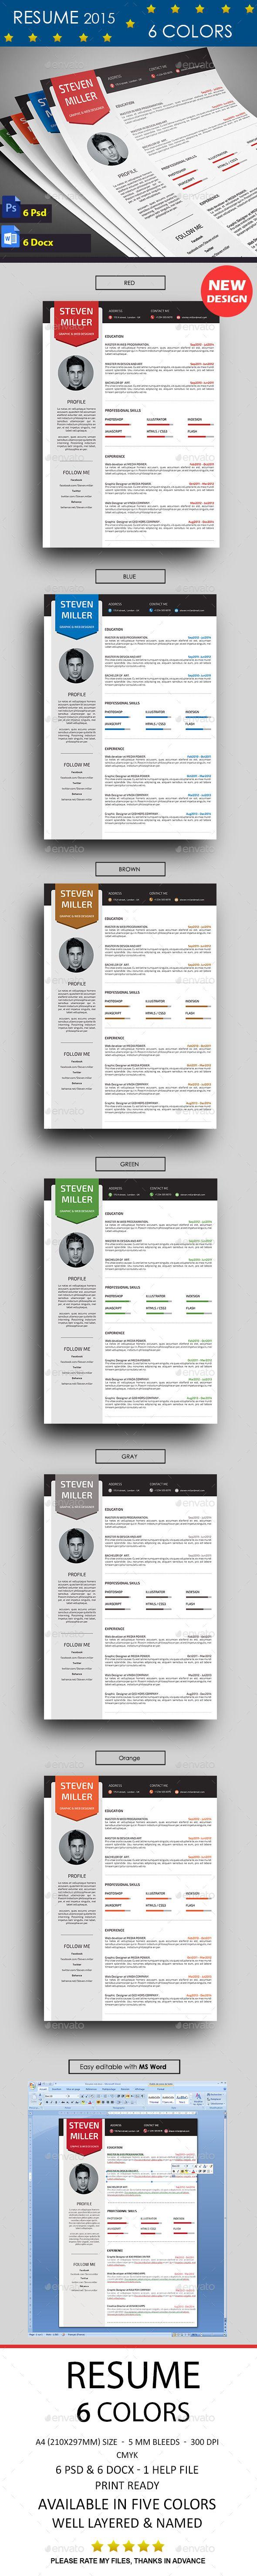 107 Best Cv Design Images On Pinterest Resume Ideas Cv Design